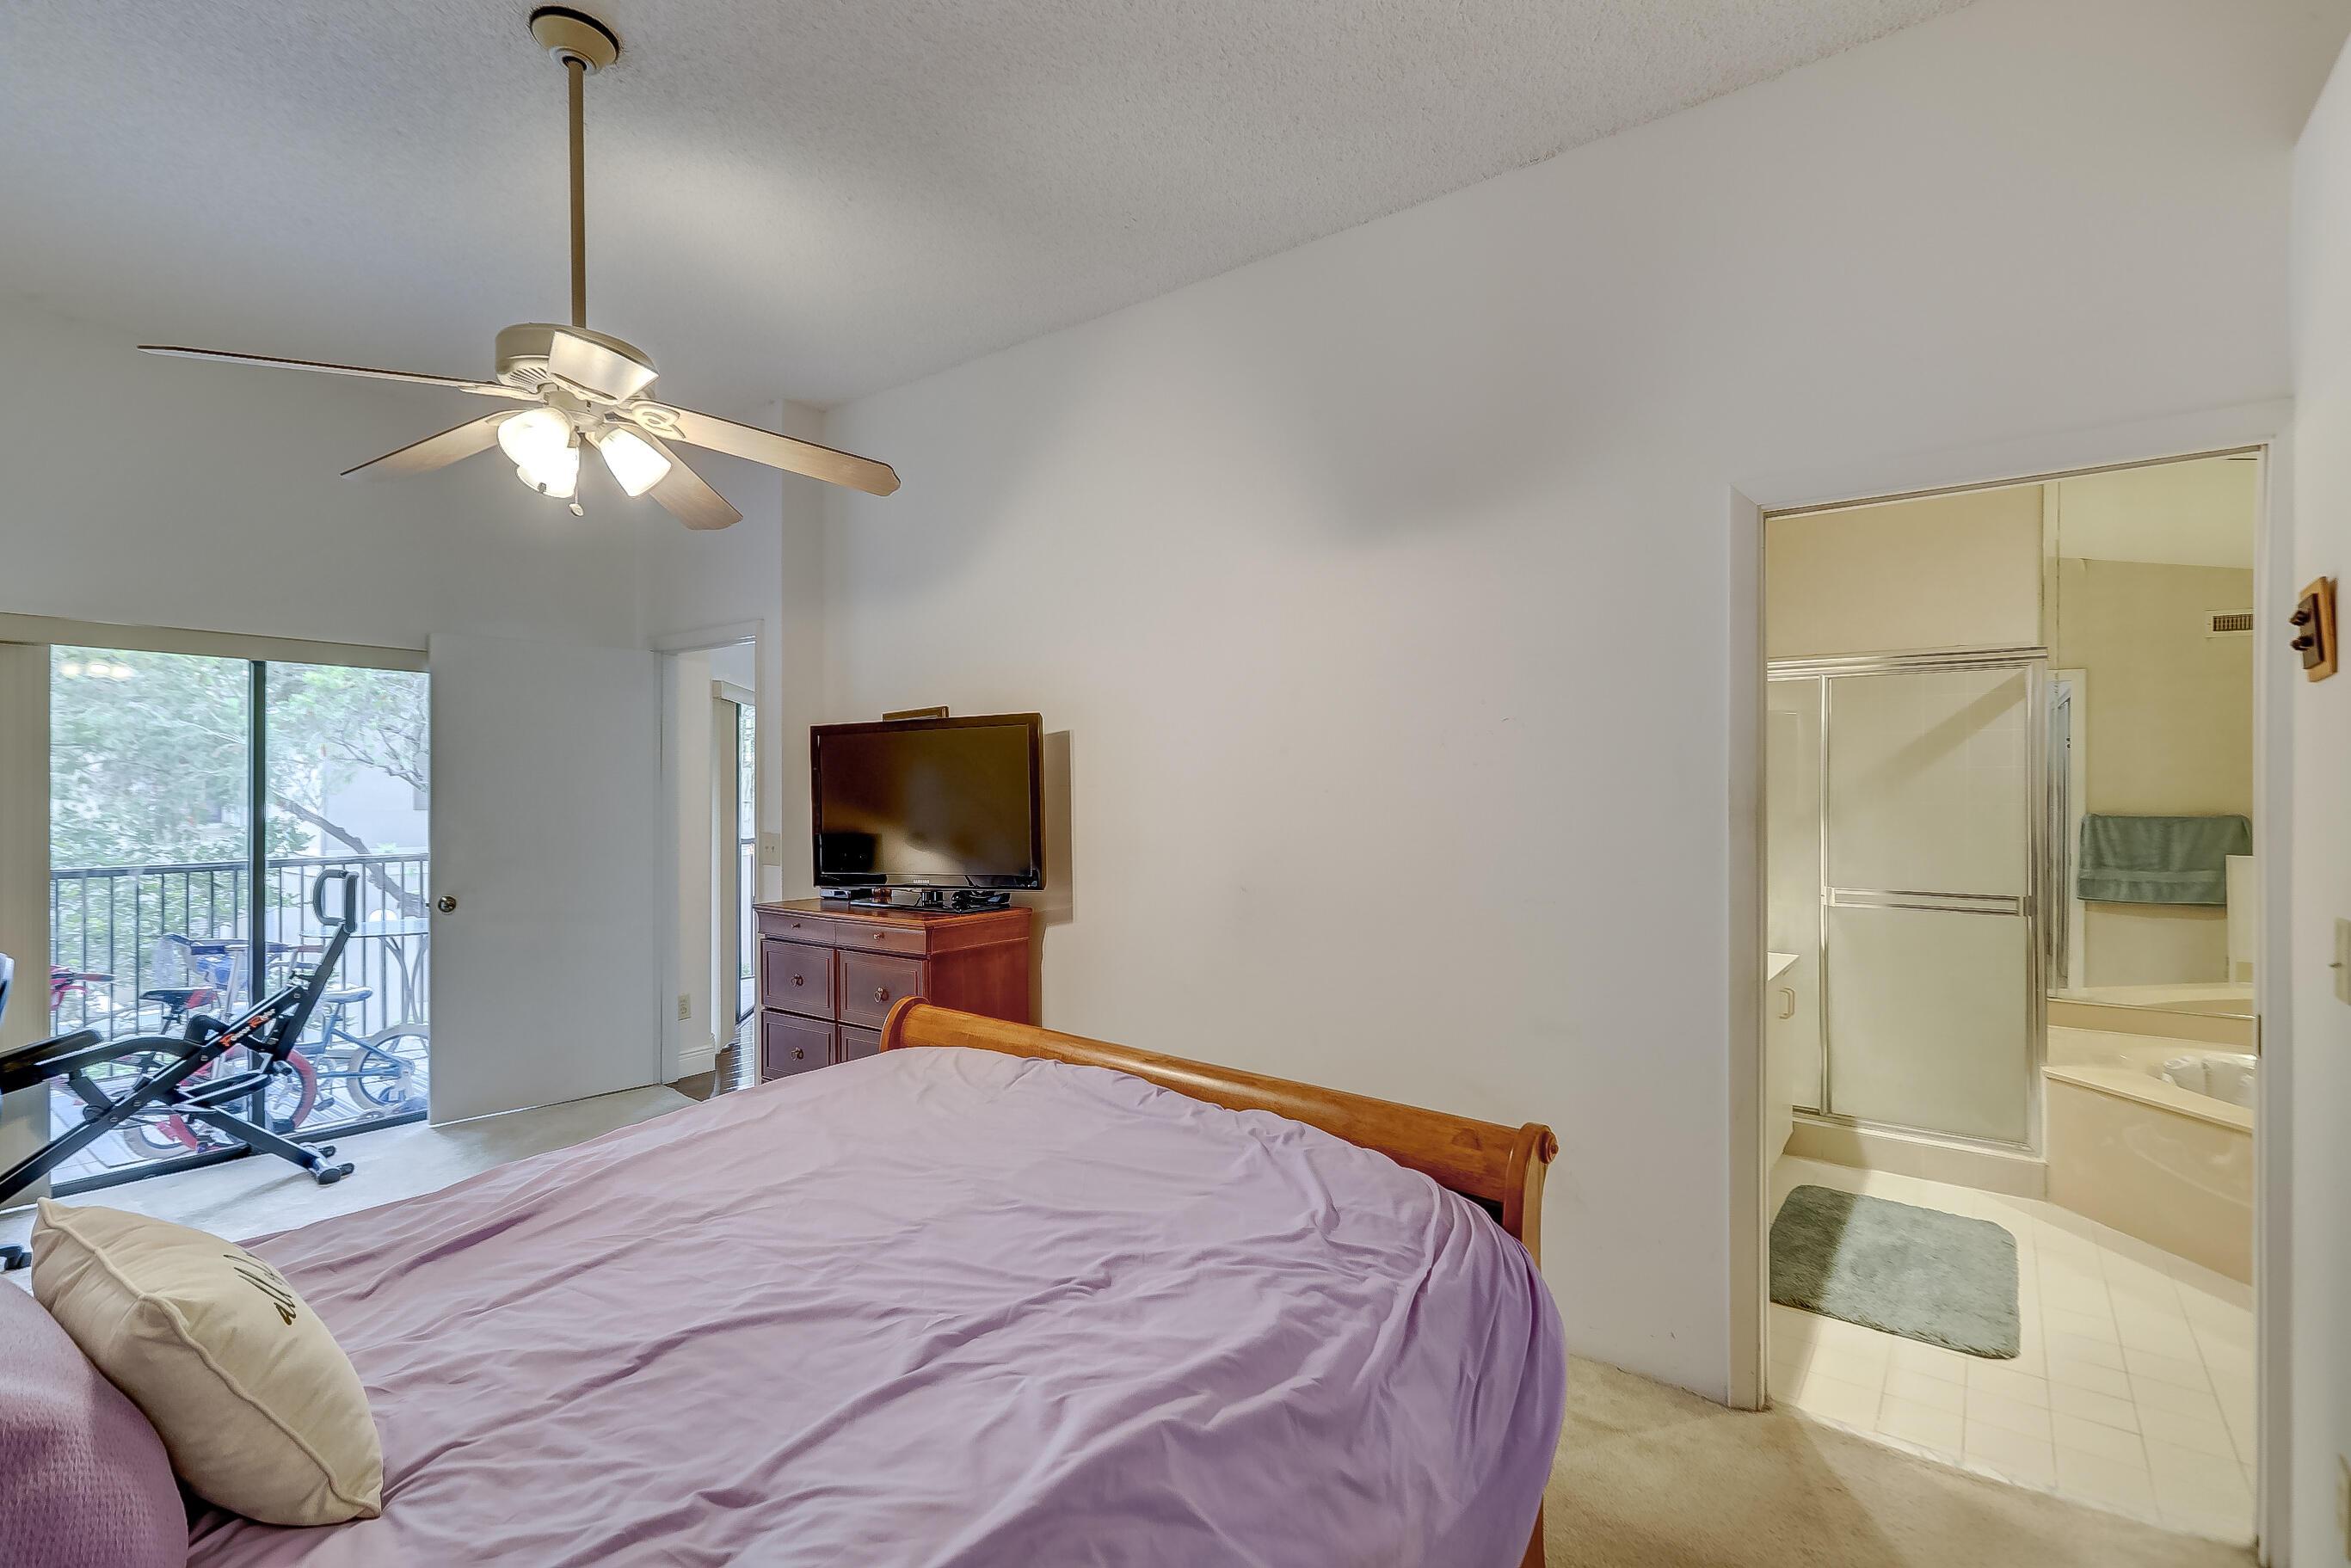 402 SW 158th Terrace 204 Pembroke Pines, FL 33027 photo 36